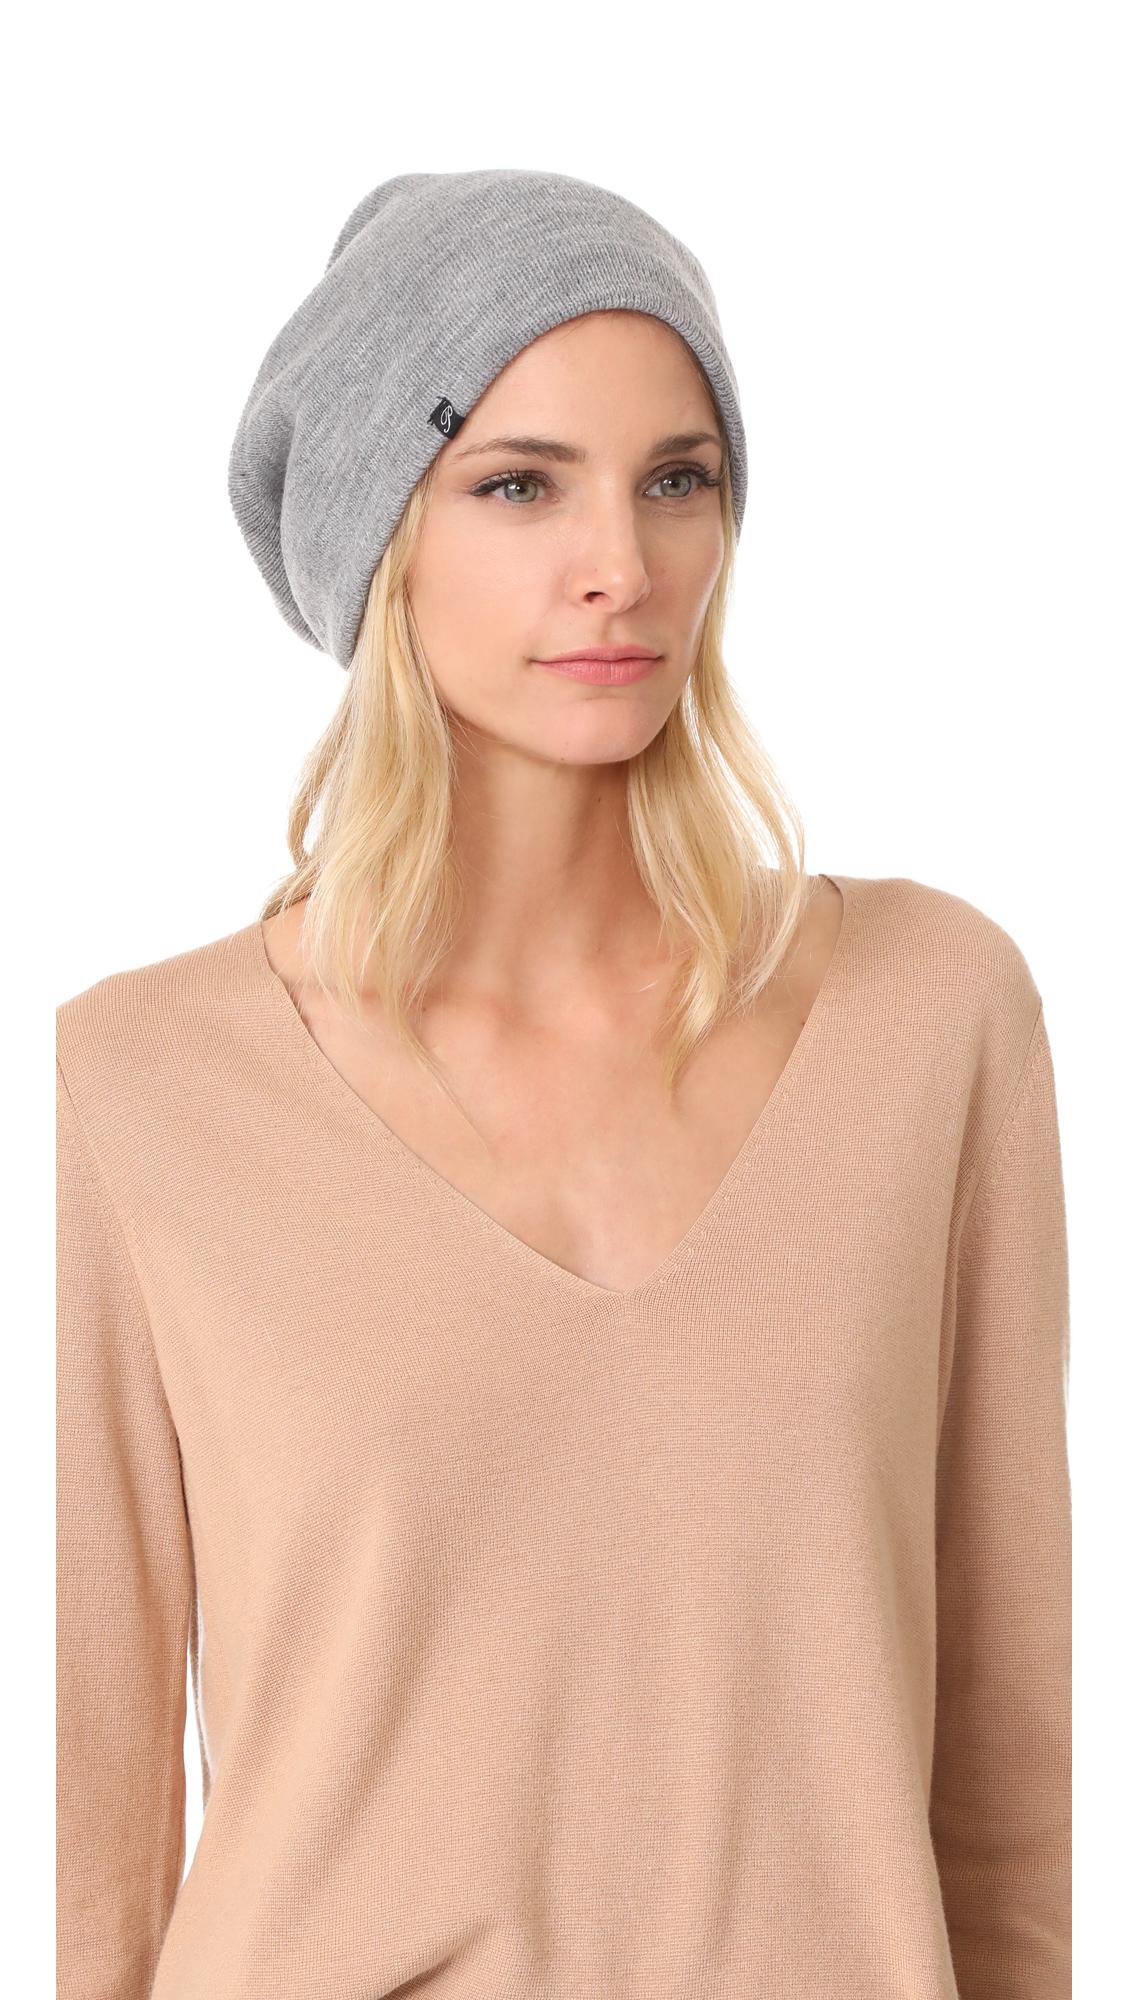 Plush Barca Slouchy Fleece Lined Hat - Grey